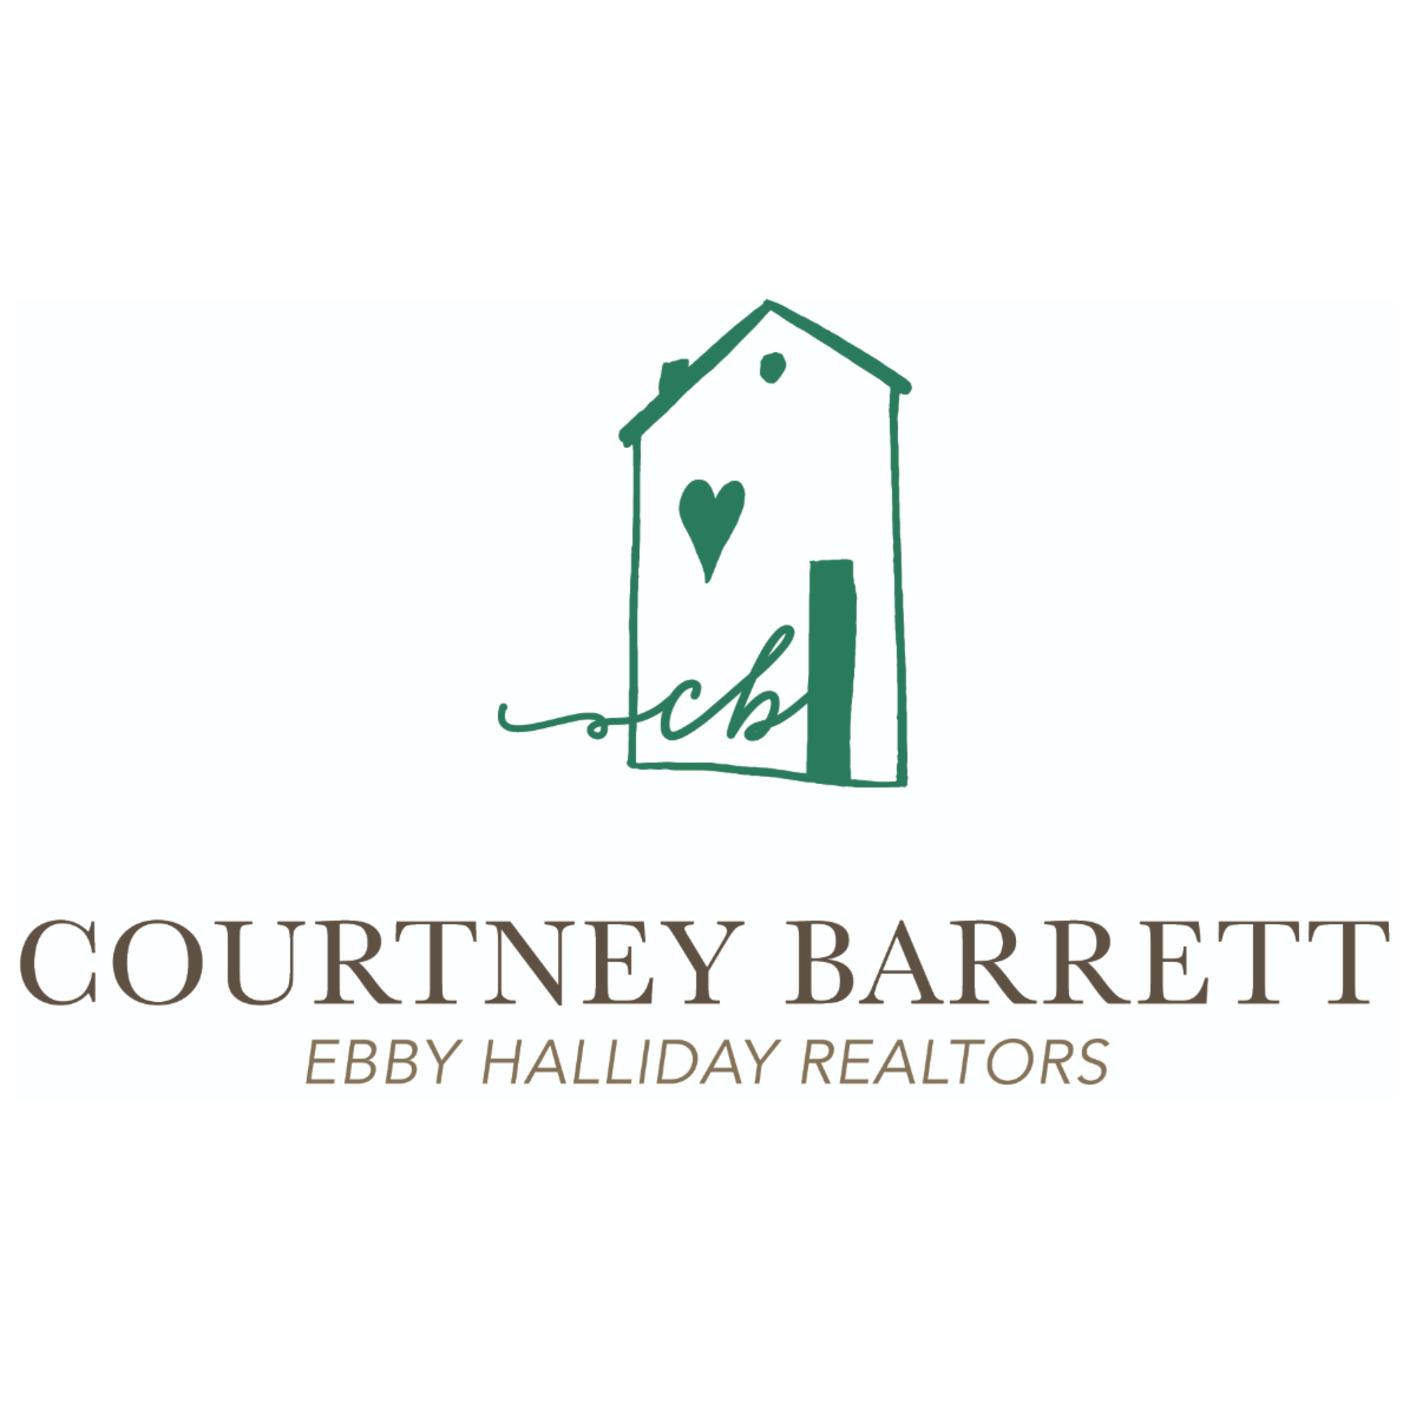 Courtney Barrett, Realtor - Ebby Halliday